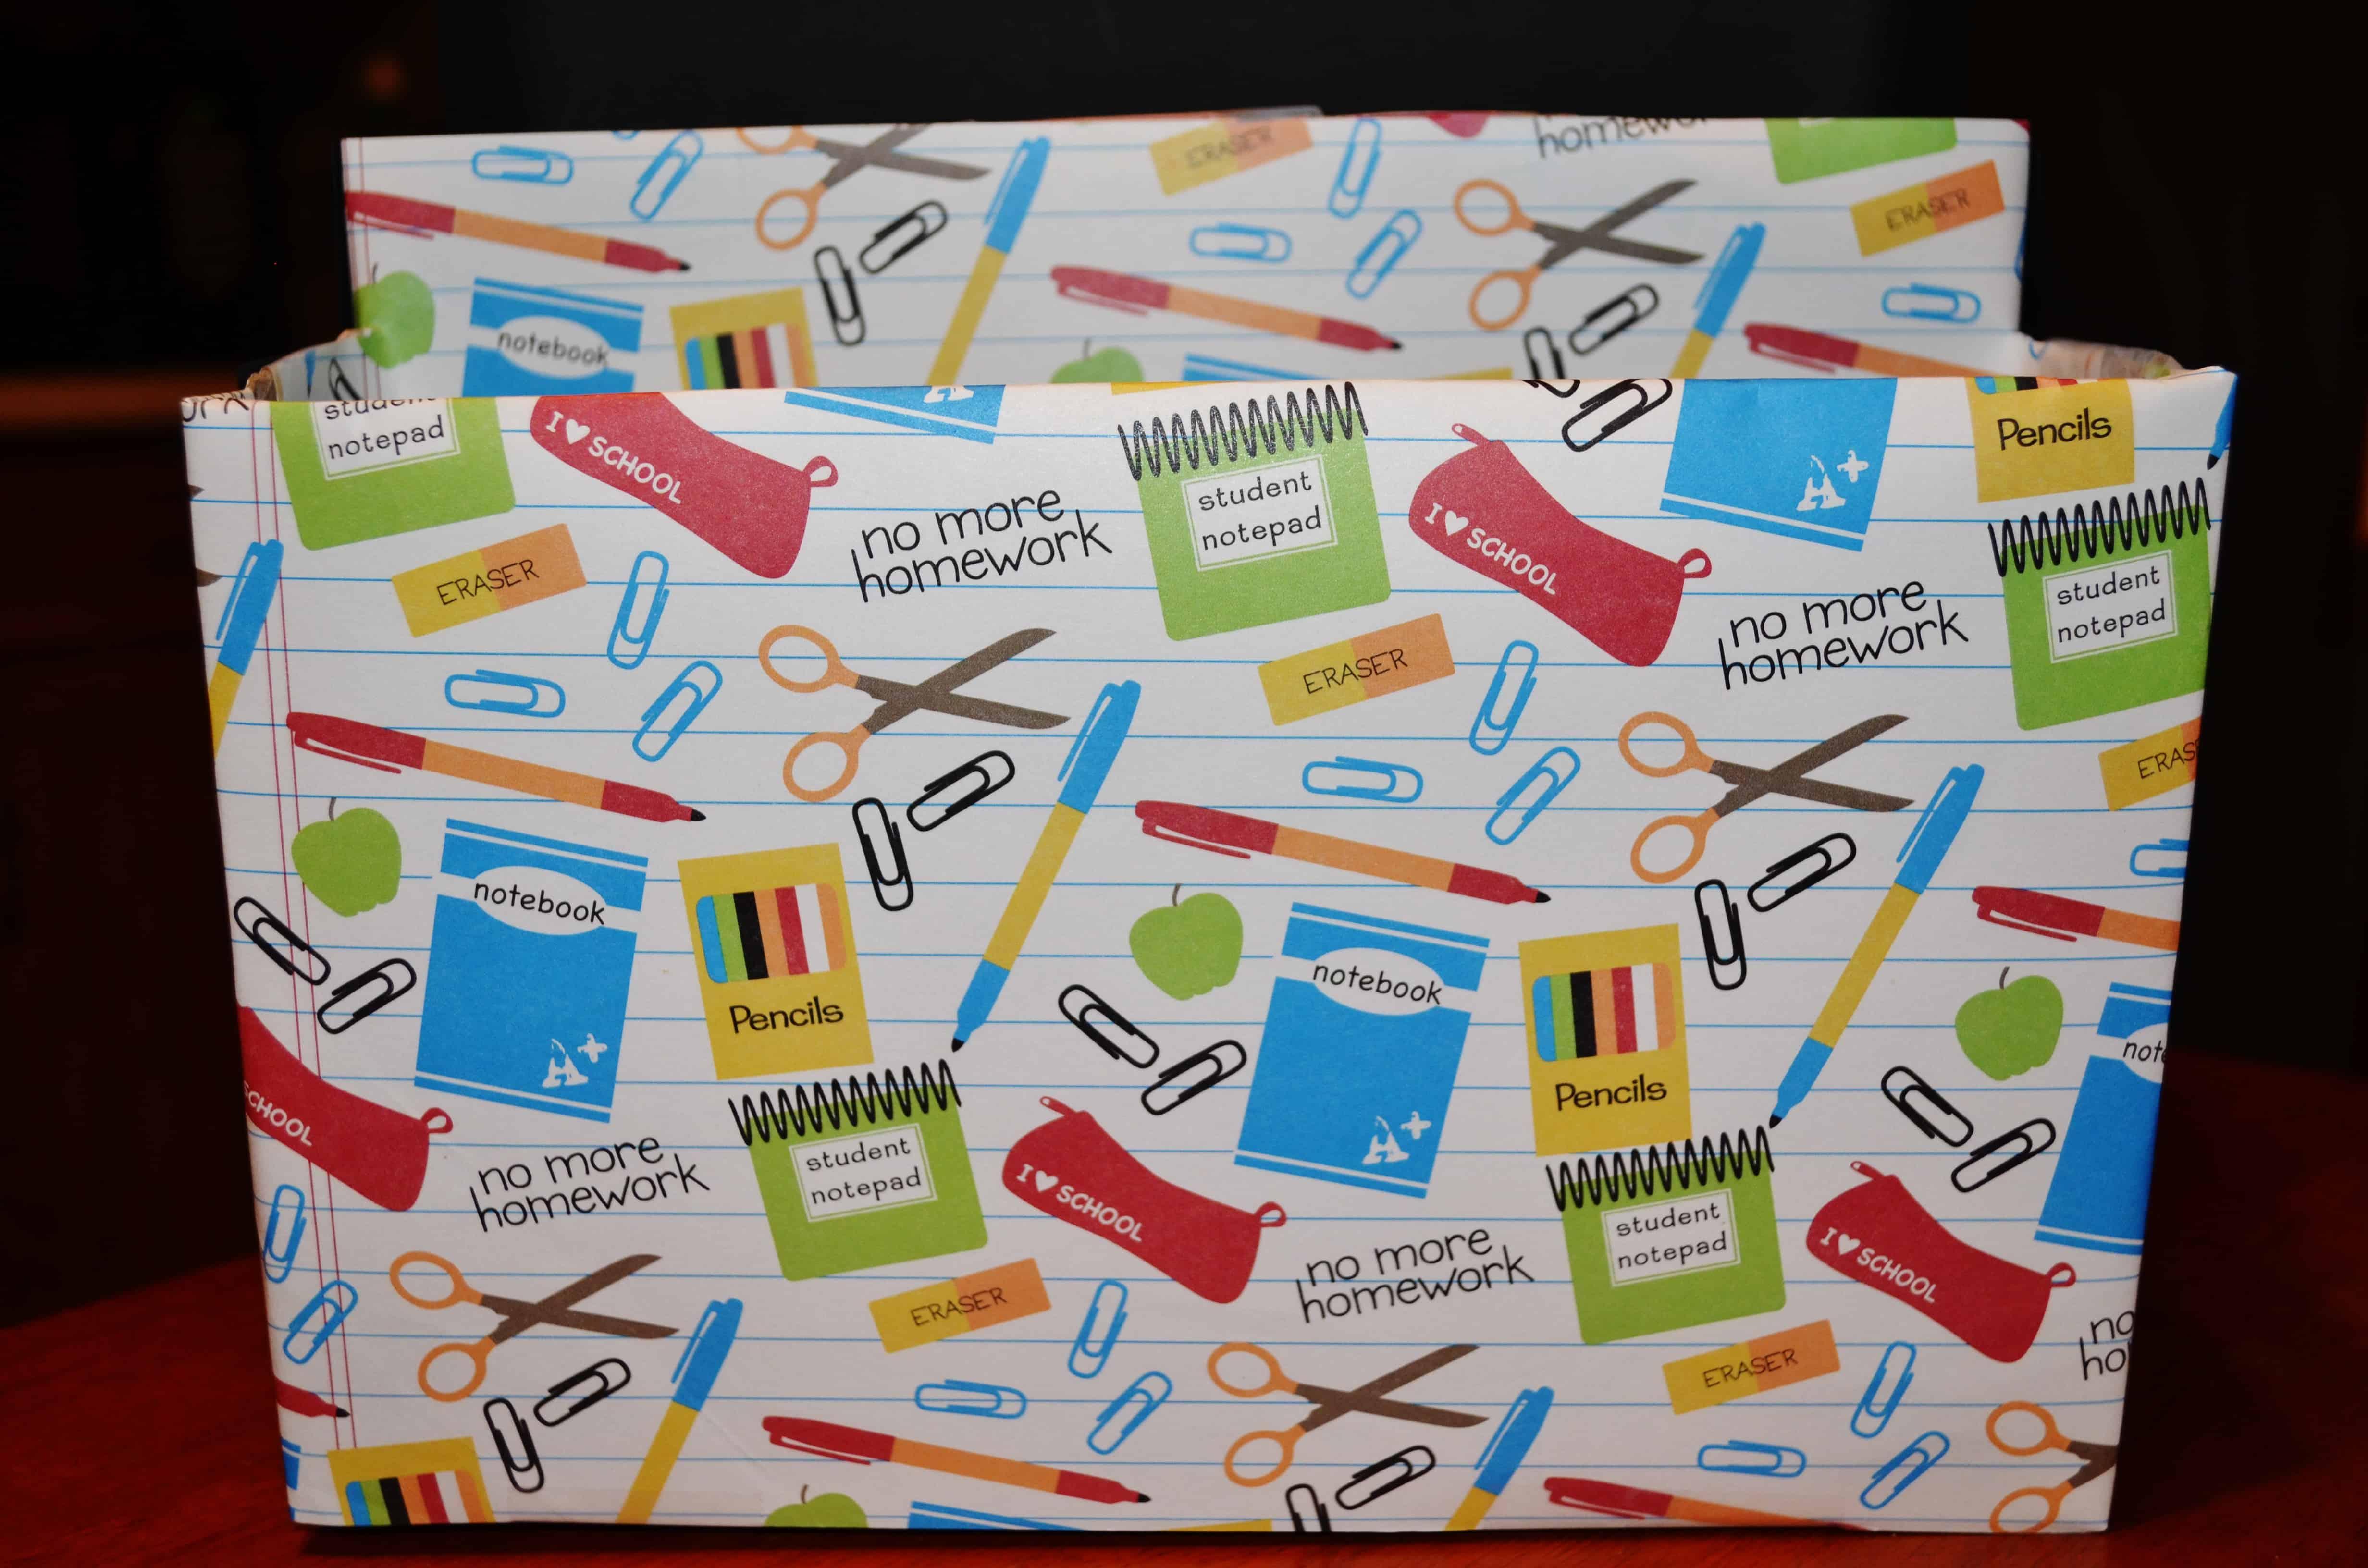 Diy stylish recycled organizer box from cereal boxes diy storage teacher organizer box ccuart Gallery